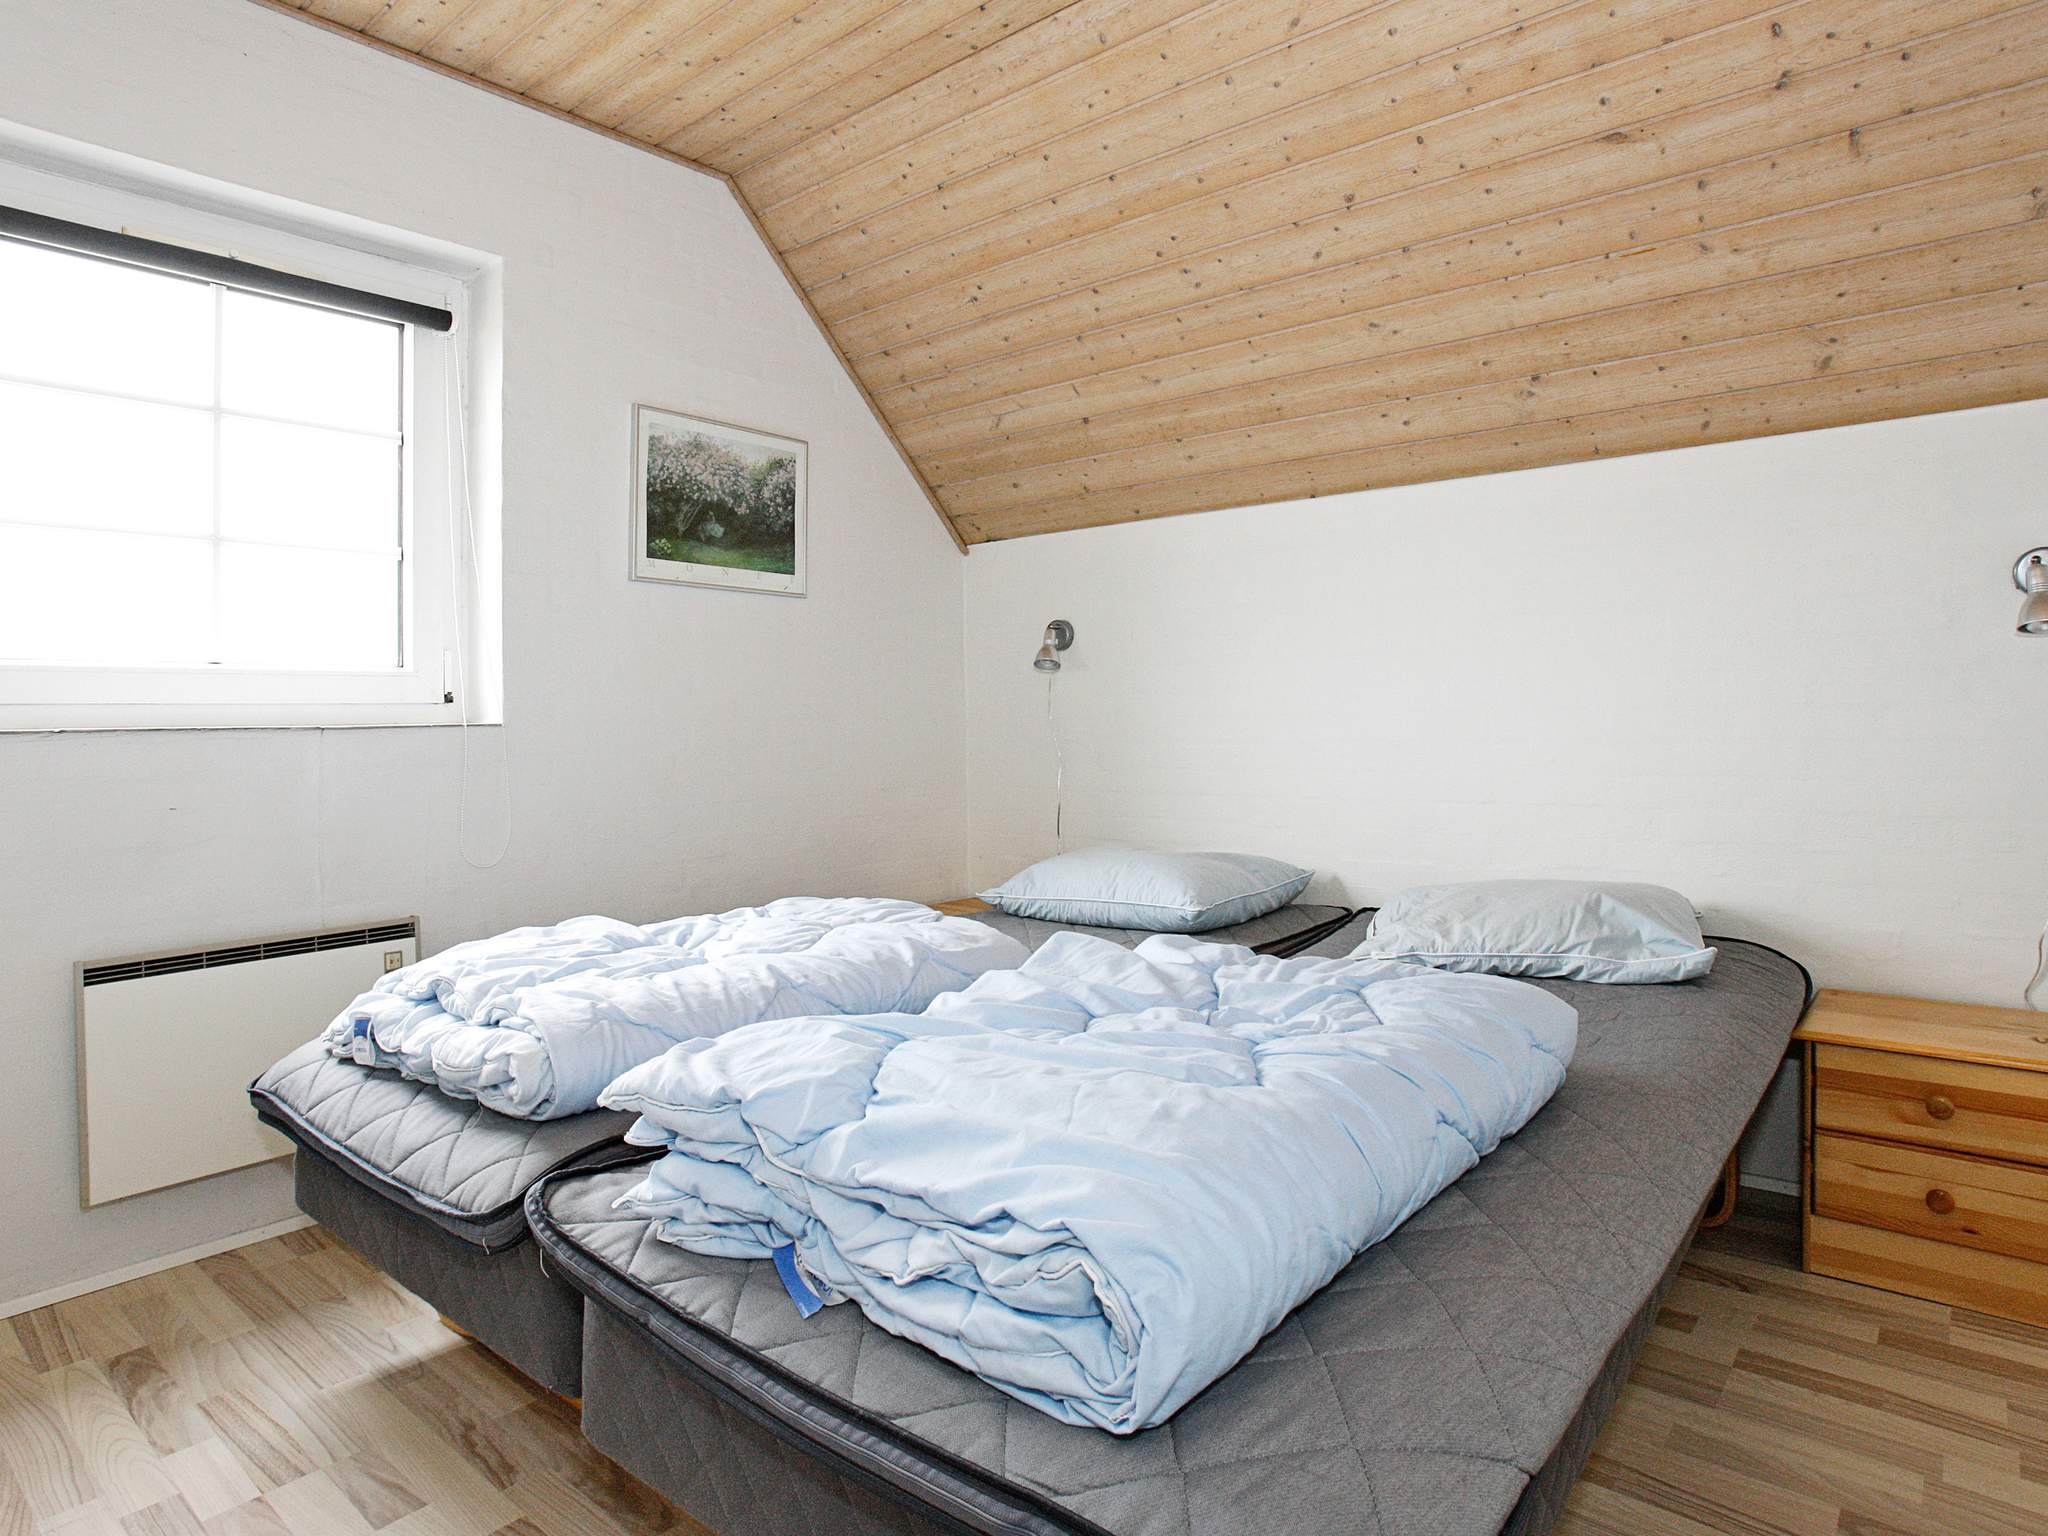 Ferienhaus Vrist (88916), Vrist, , Limfjord, Dänemark, Bild 10